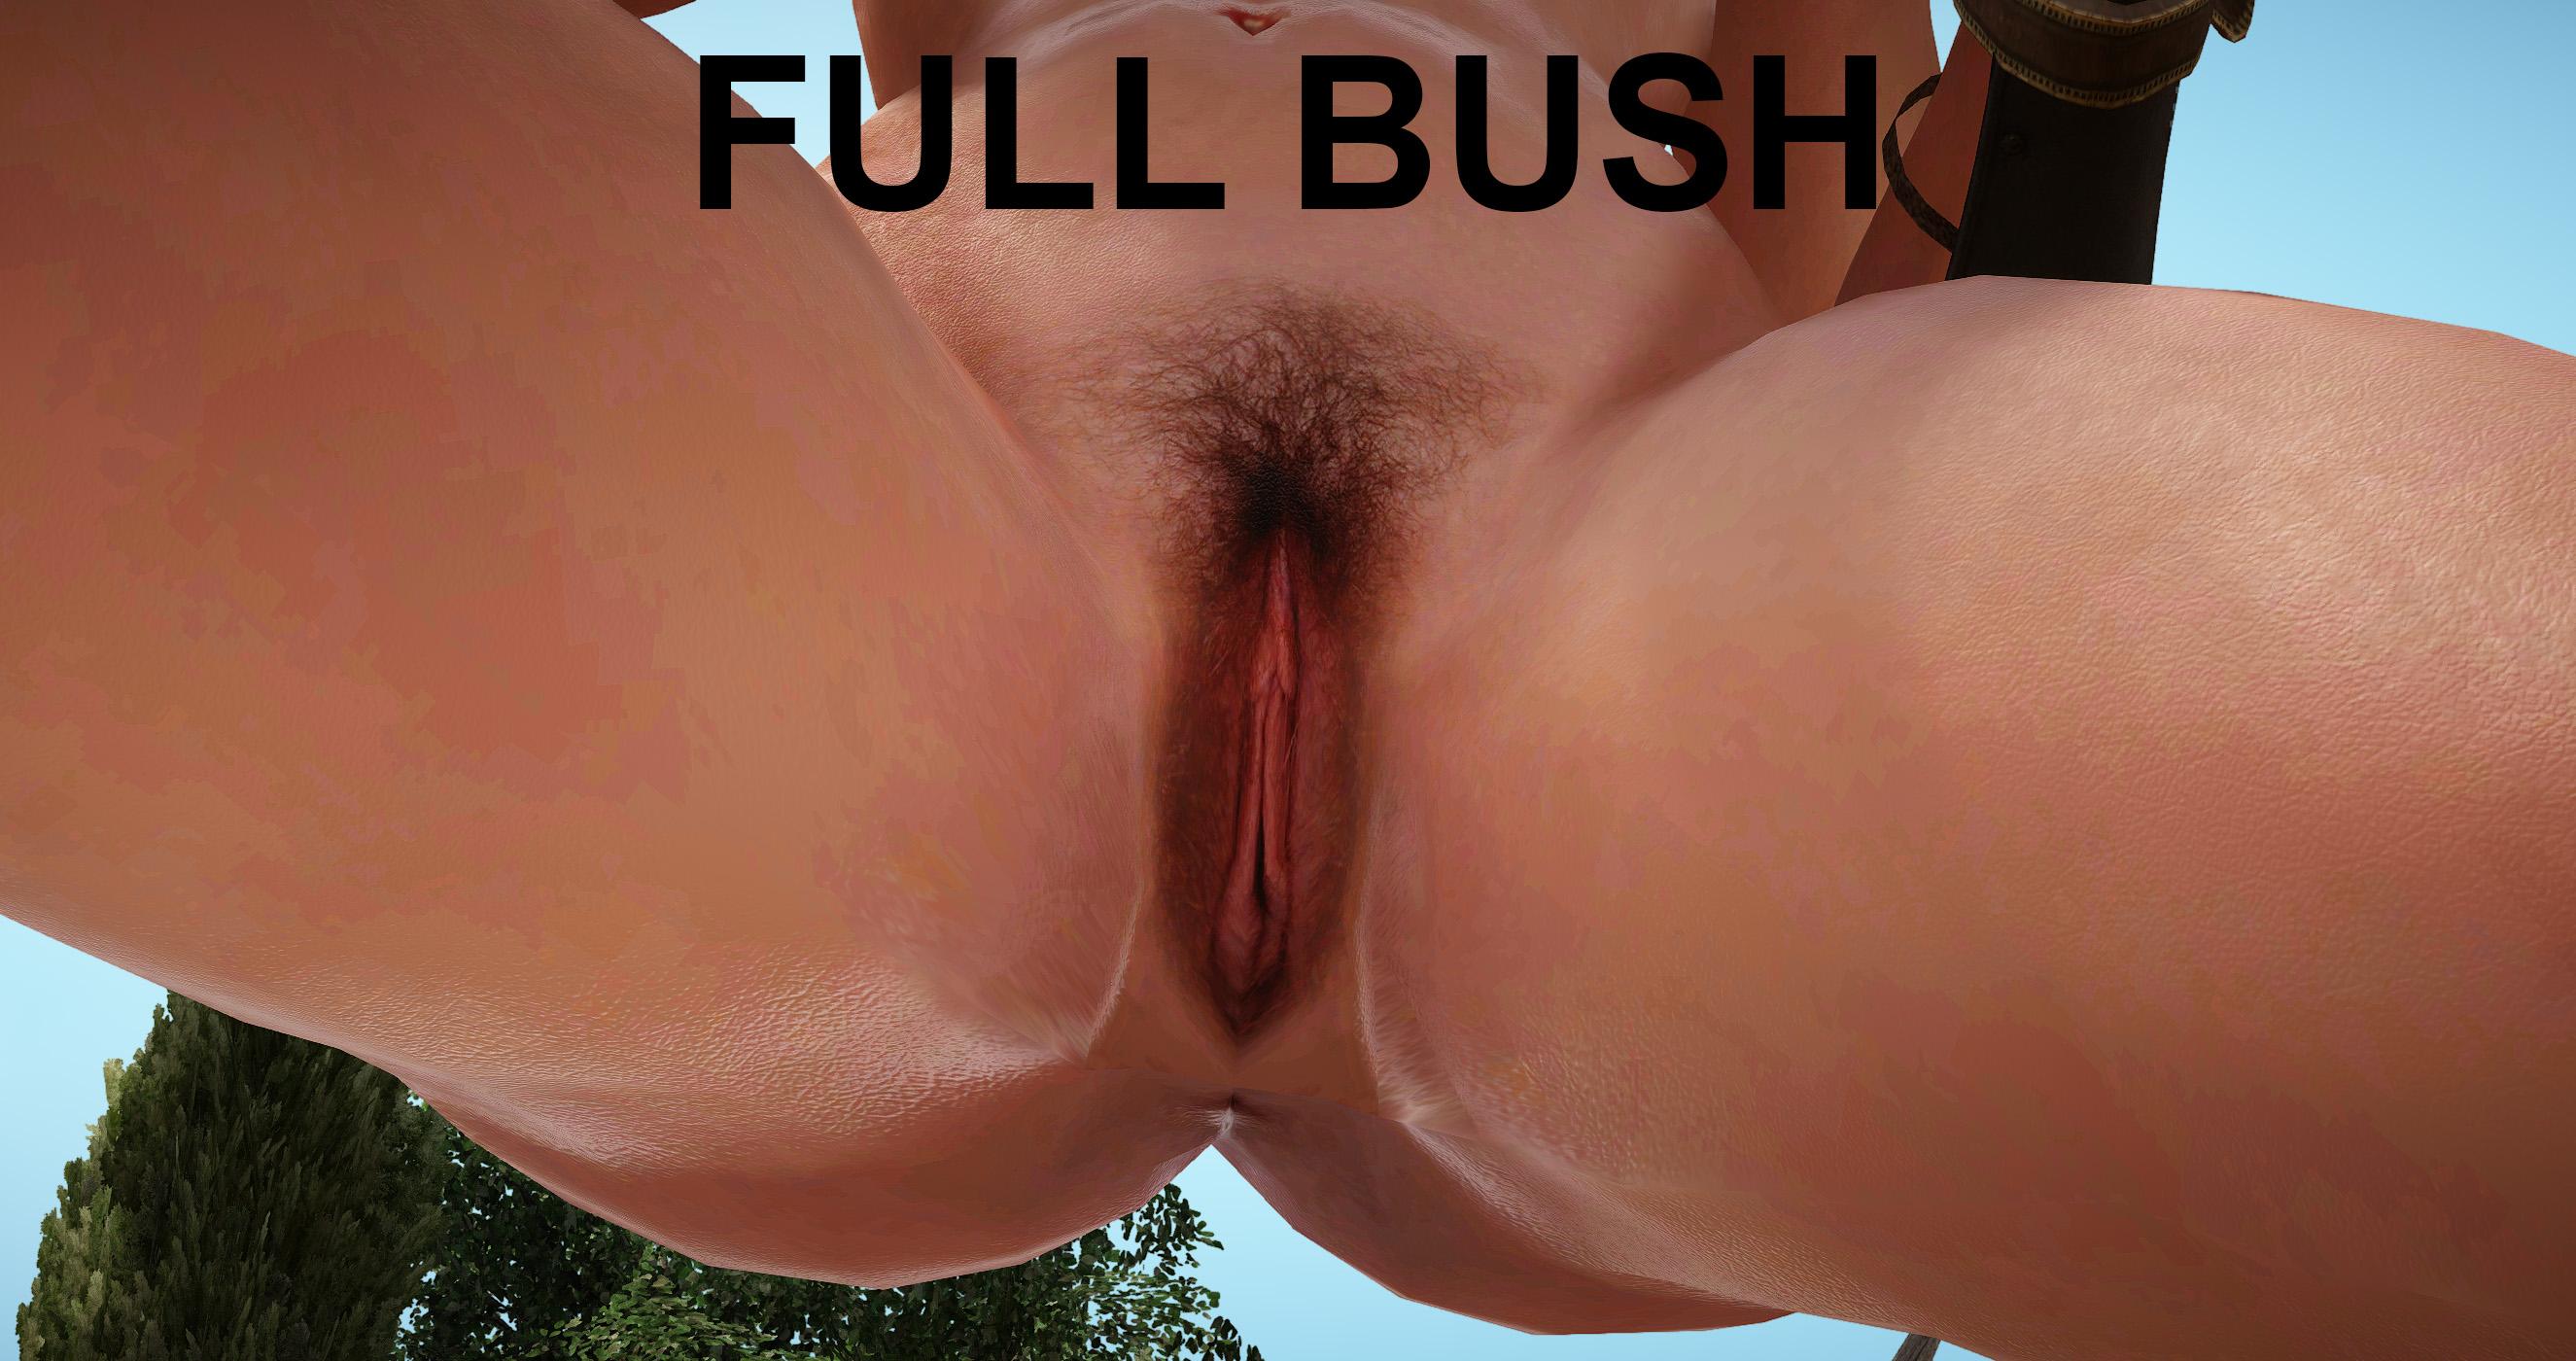 full_bush-jpg.60004